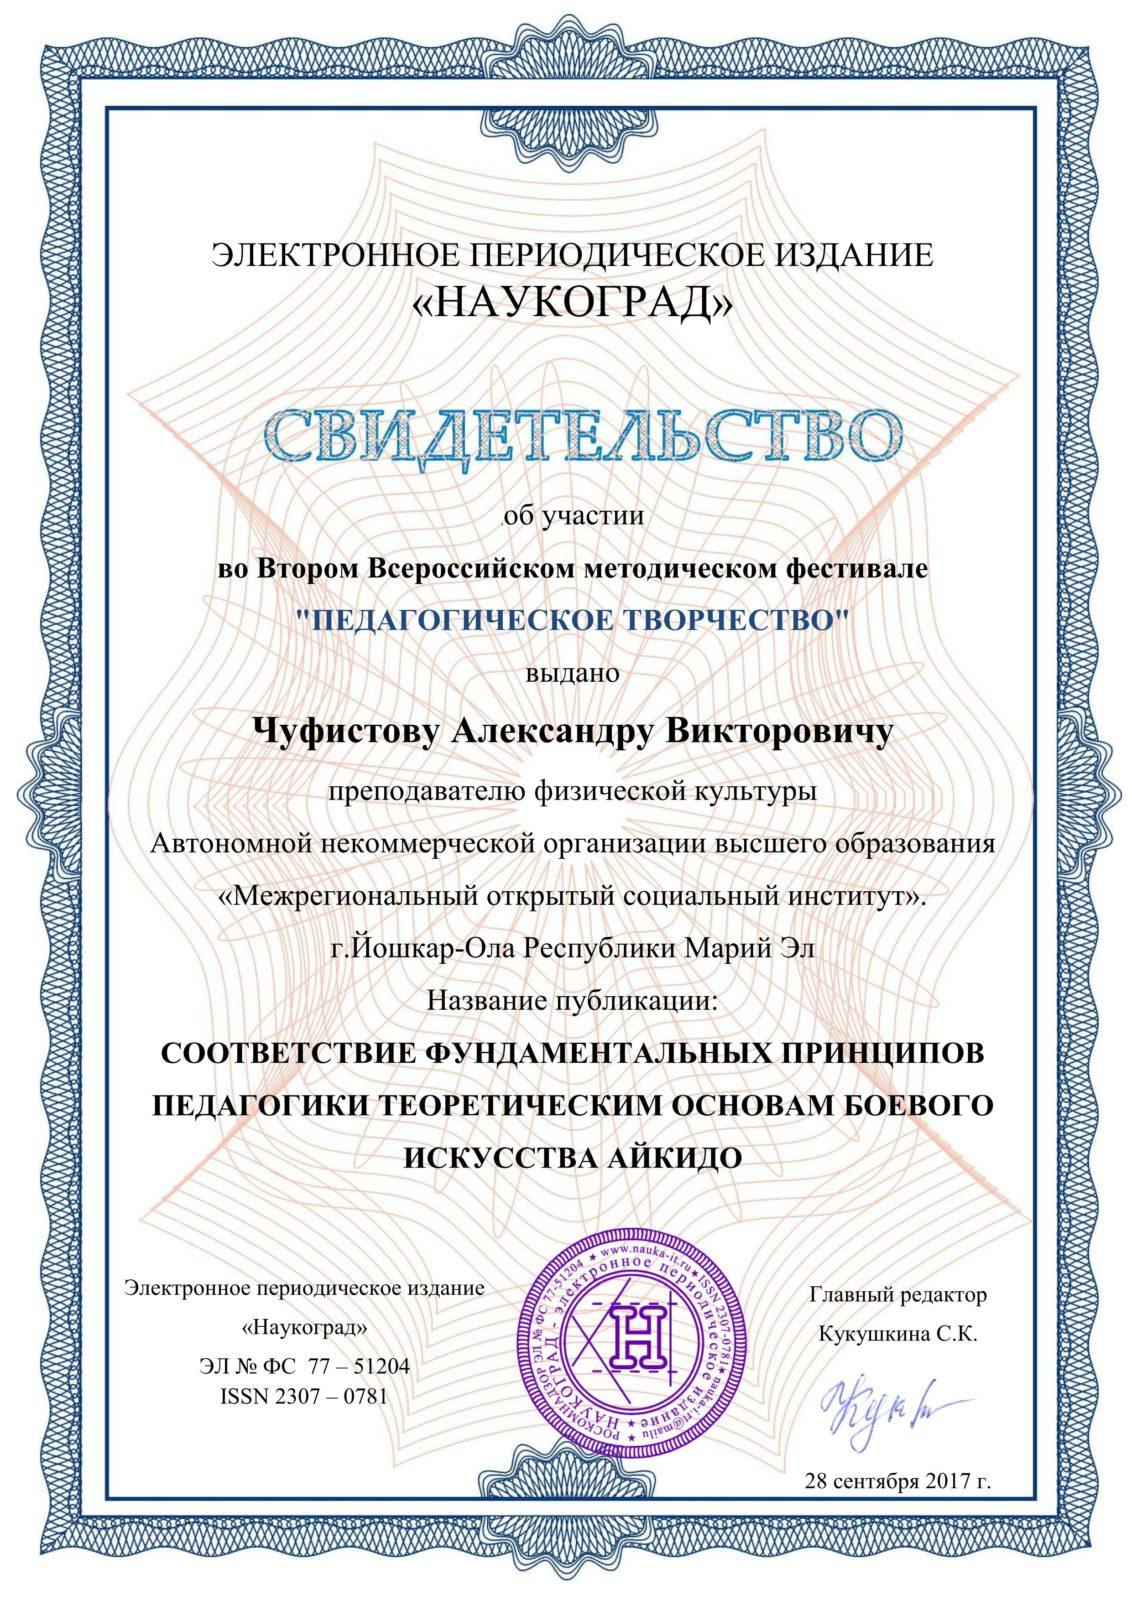 Чуфистову Александру Викторовичу_280917_01